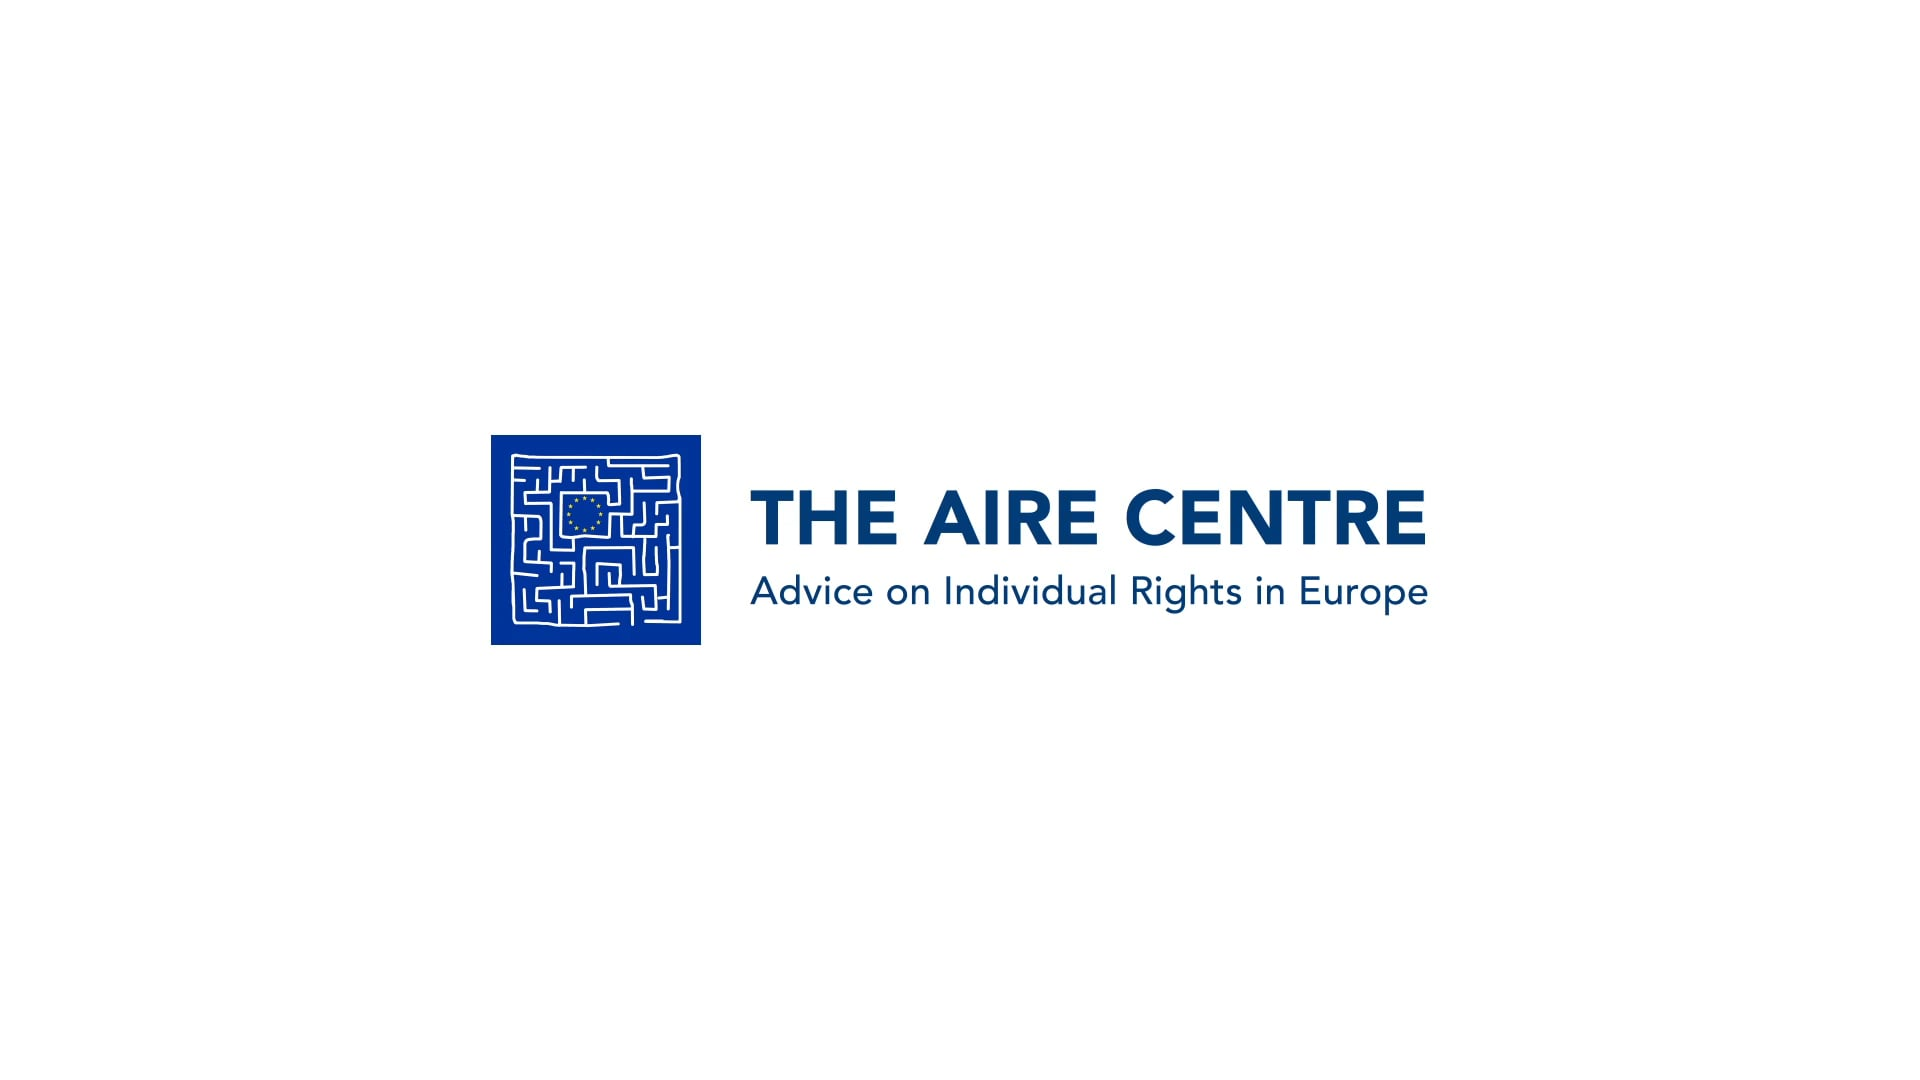 The AIRE Centre logo